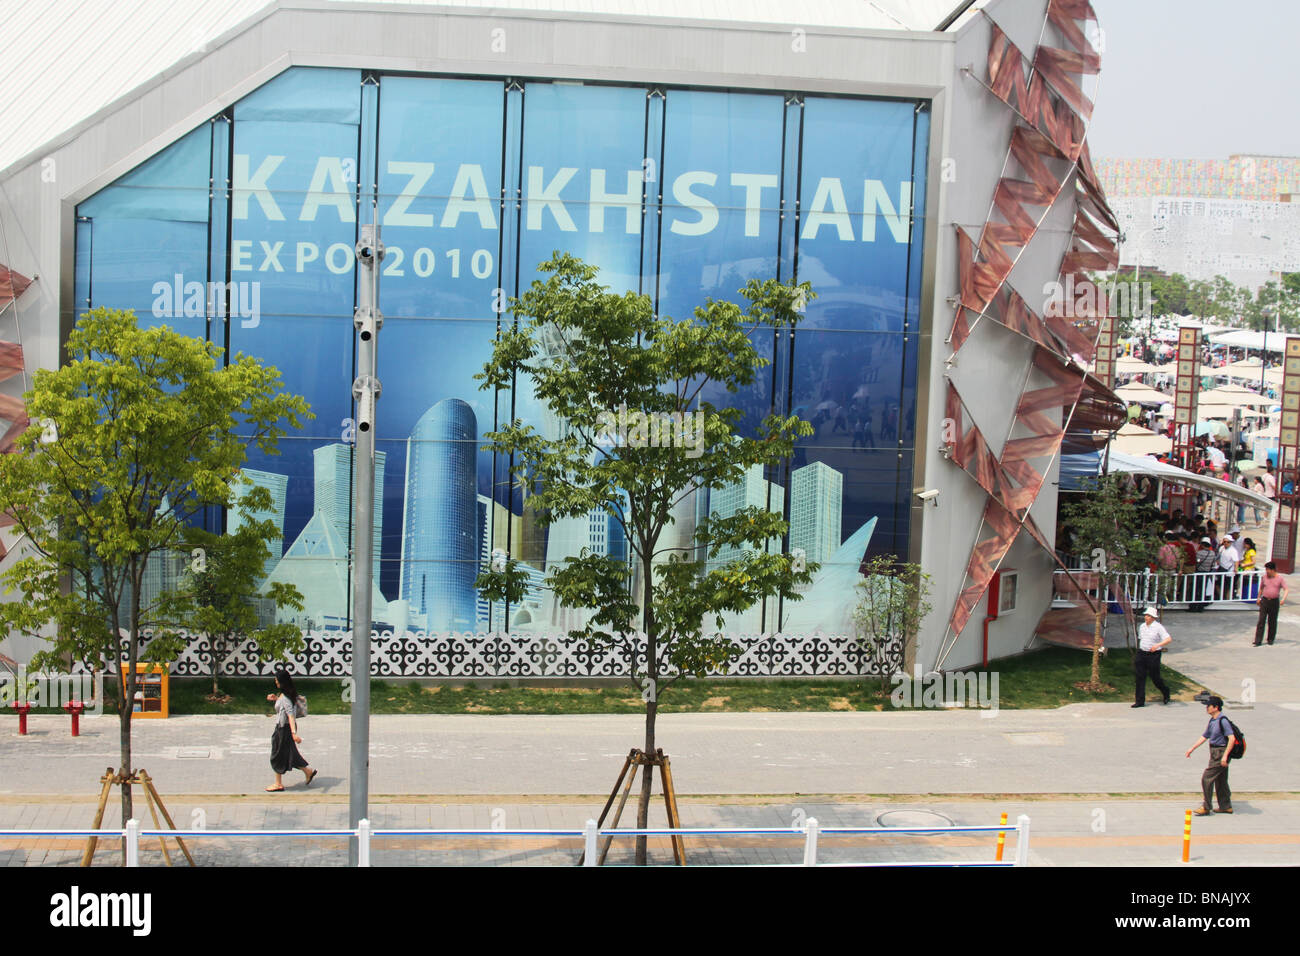 Kazakhstan Pavilion. 2010 Shanghai World Expo Park, Pudong, Shanghai, China. World's Fair. - Stock Image